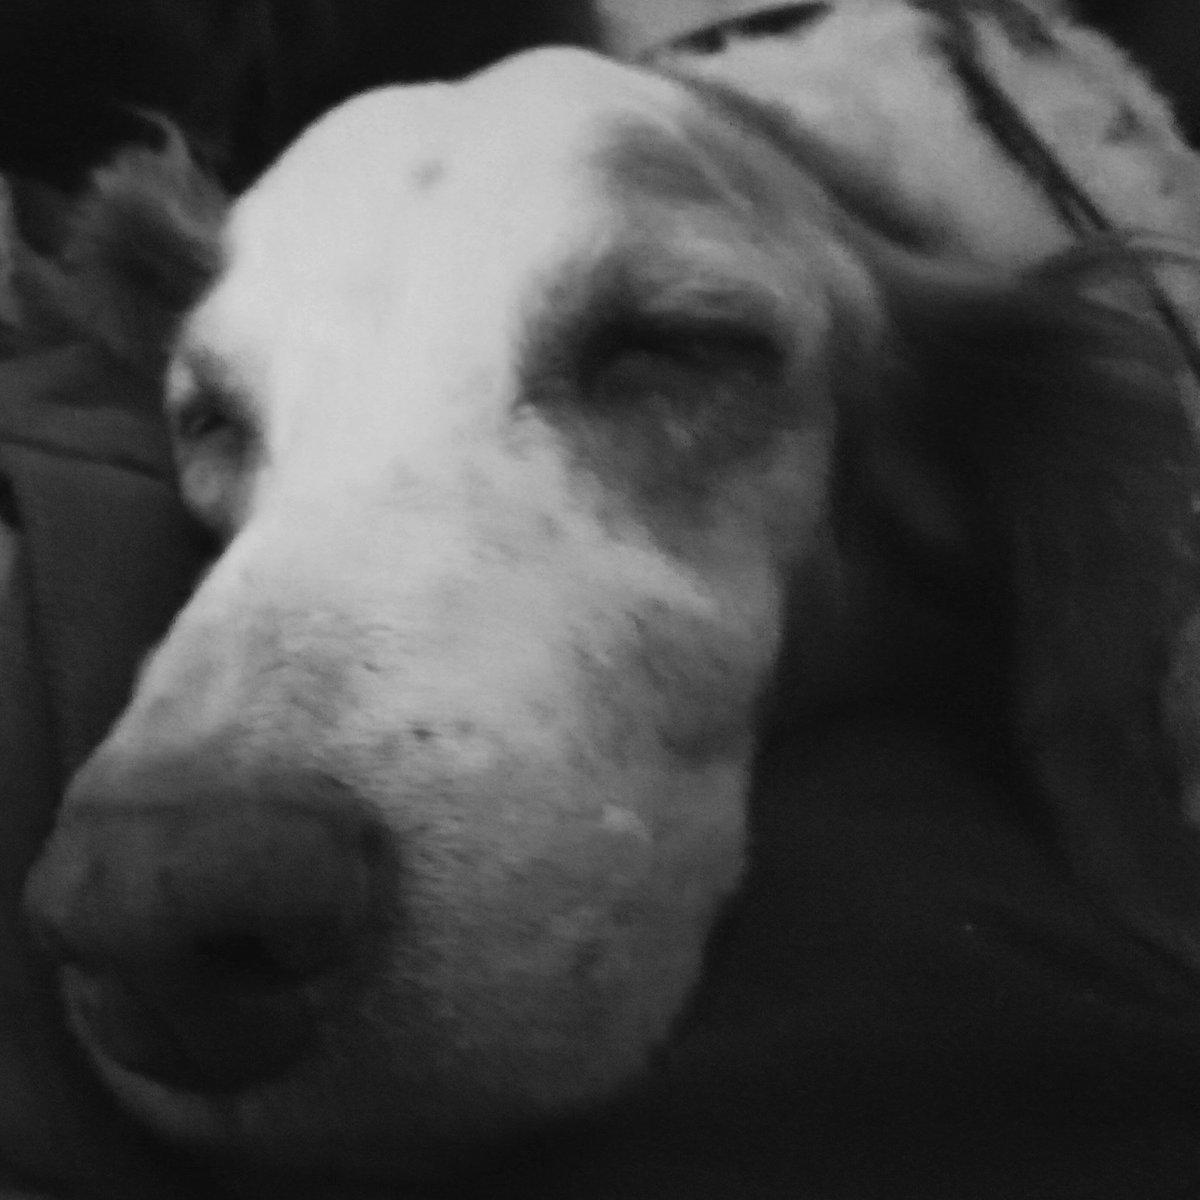 Relaxed  #blackandwhitephotography  #DogsofTwittter pic.twitter.com/MQ0Zu7LVdd